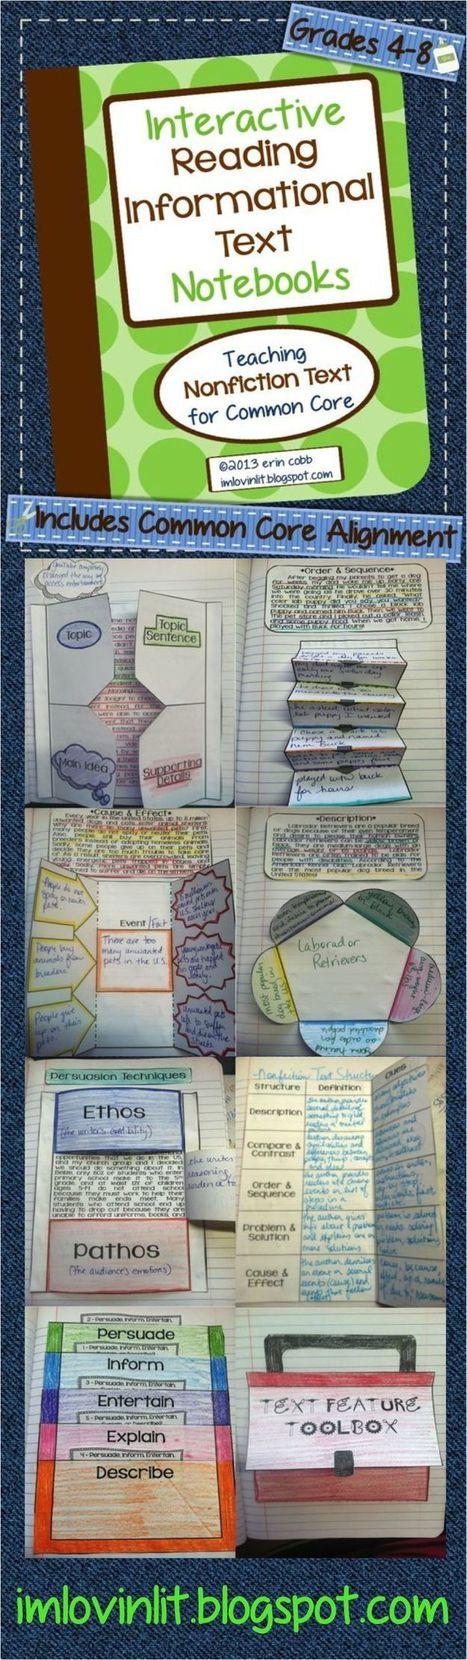 Education   Social Studies Teacher   Scoop.it